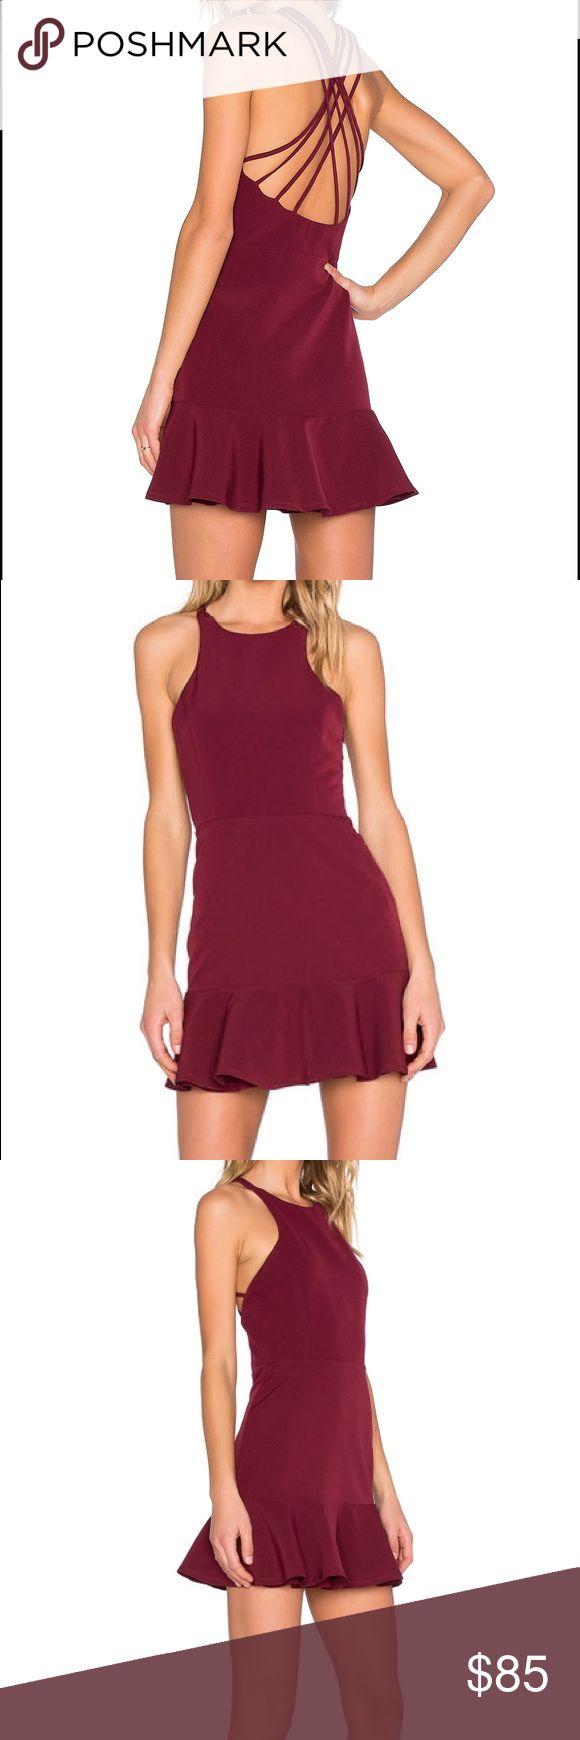 "NBD • Bound For Glory Dress NBD Bound For Glory Dress in Oxblood NWT Retail $170  - Crew neck - Sleeveless - Hidden side zip closure - Multi-strap crisscross back - Flounced hem - Solid construction - Lined - Approx. 34.5"" length NBD Dresses Mini"